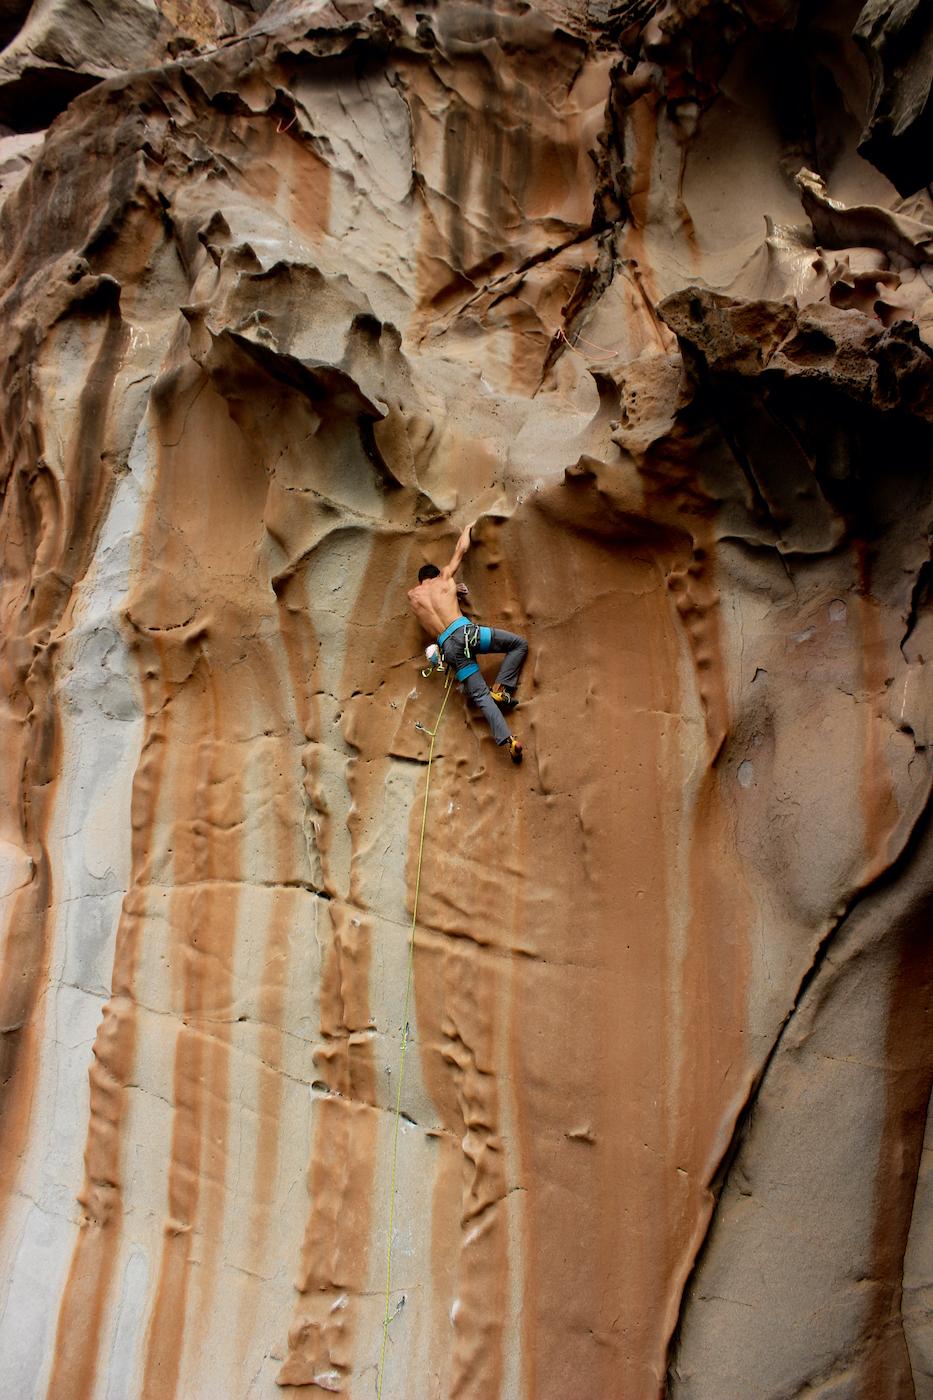 The best rock climbign destination in Africa?